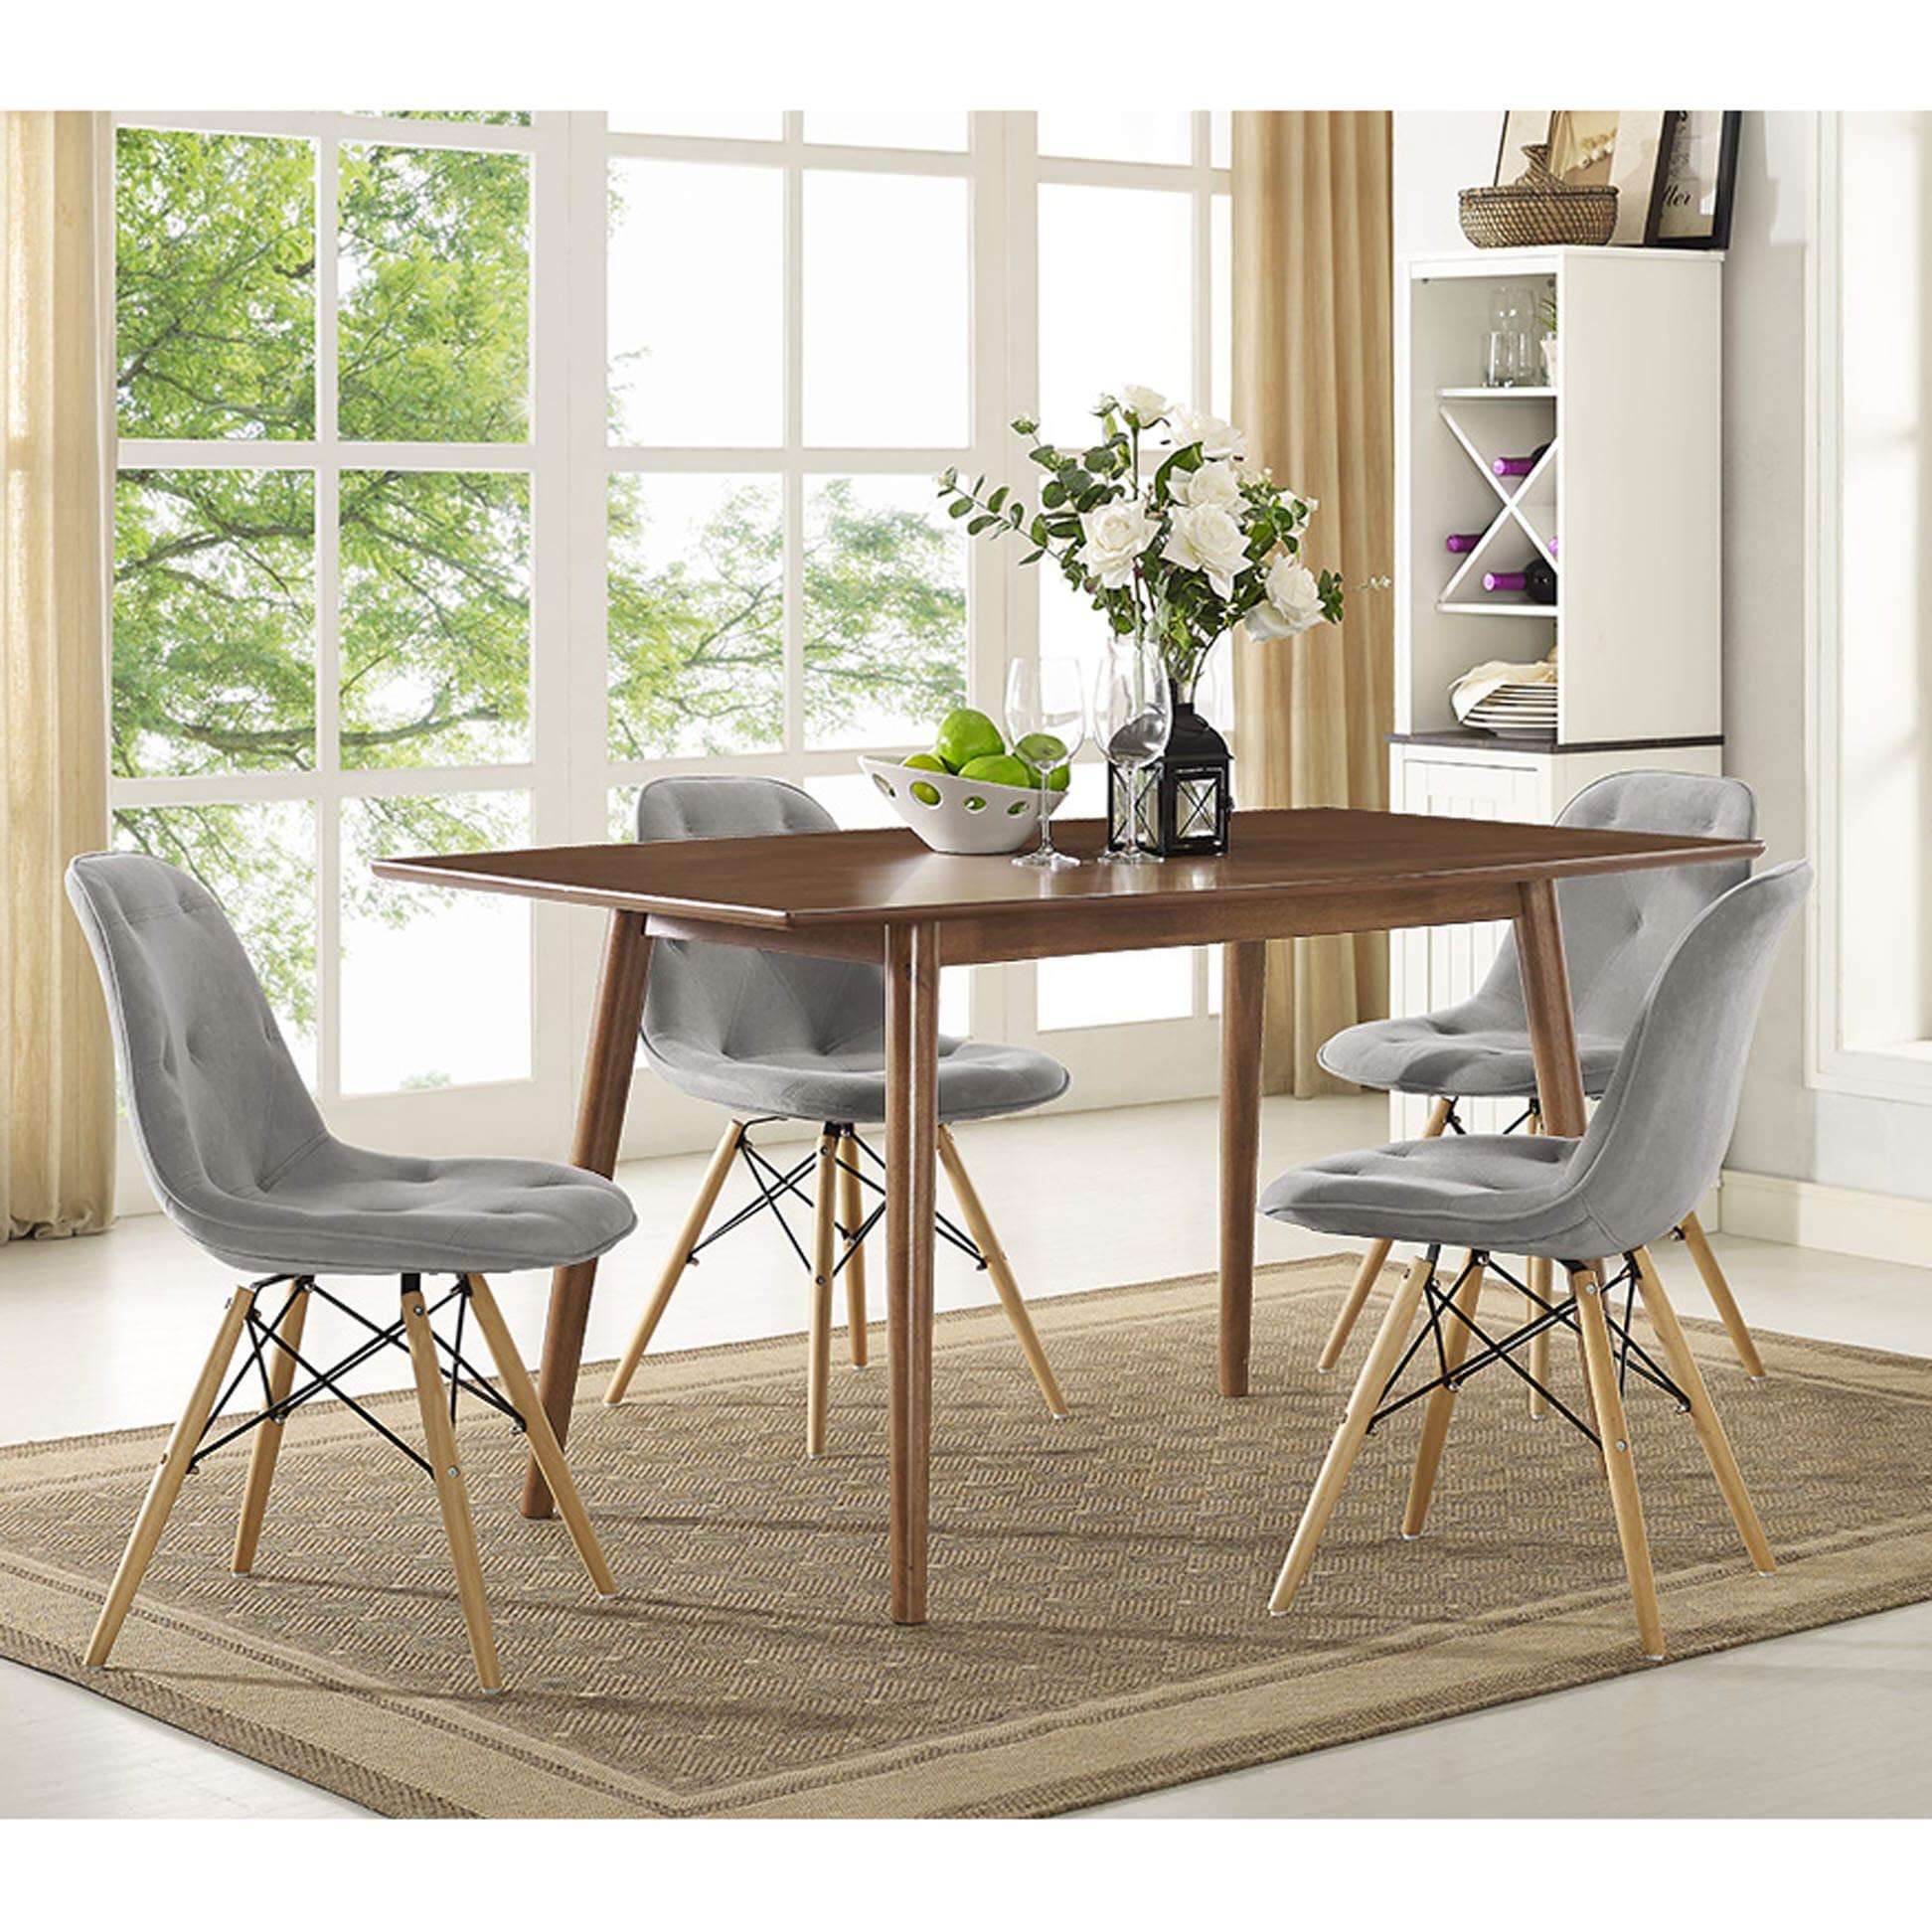 Mid century dining table - Mid Century Dining Table 53